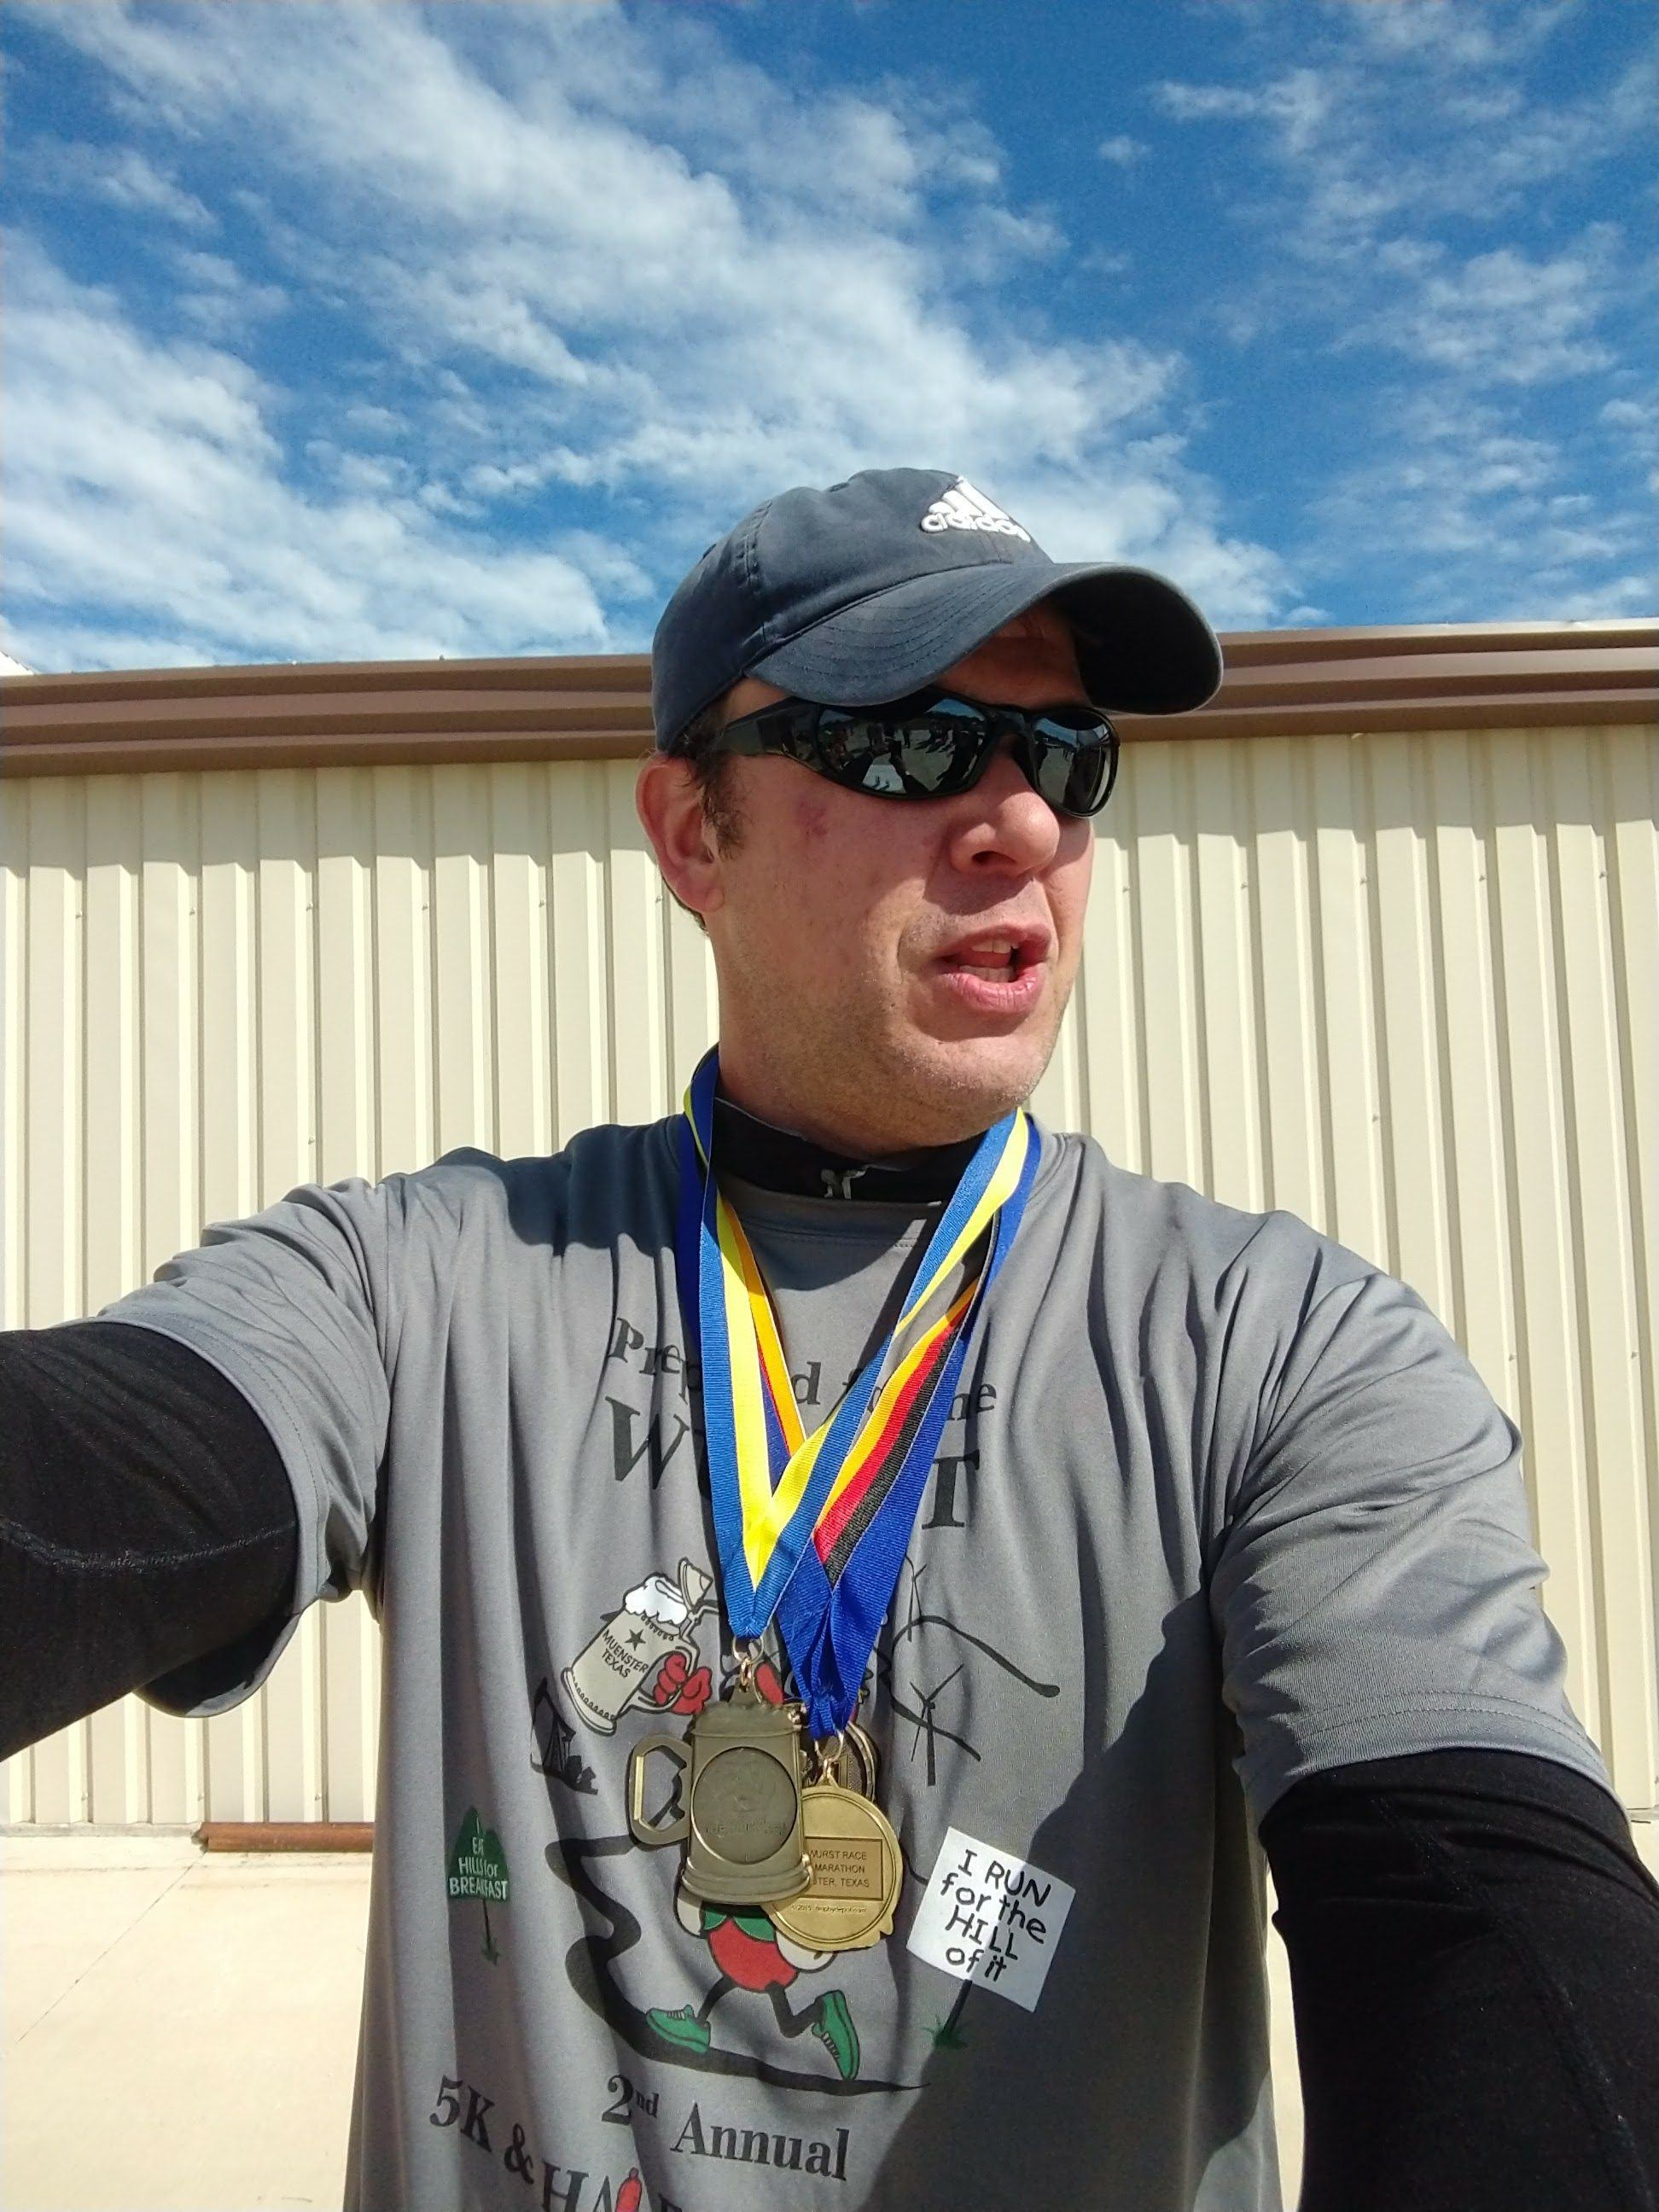 how to run a half marathon for beginners